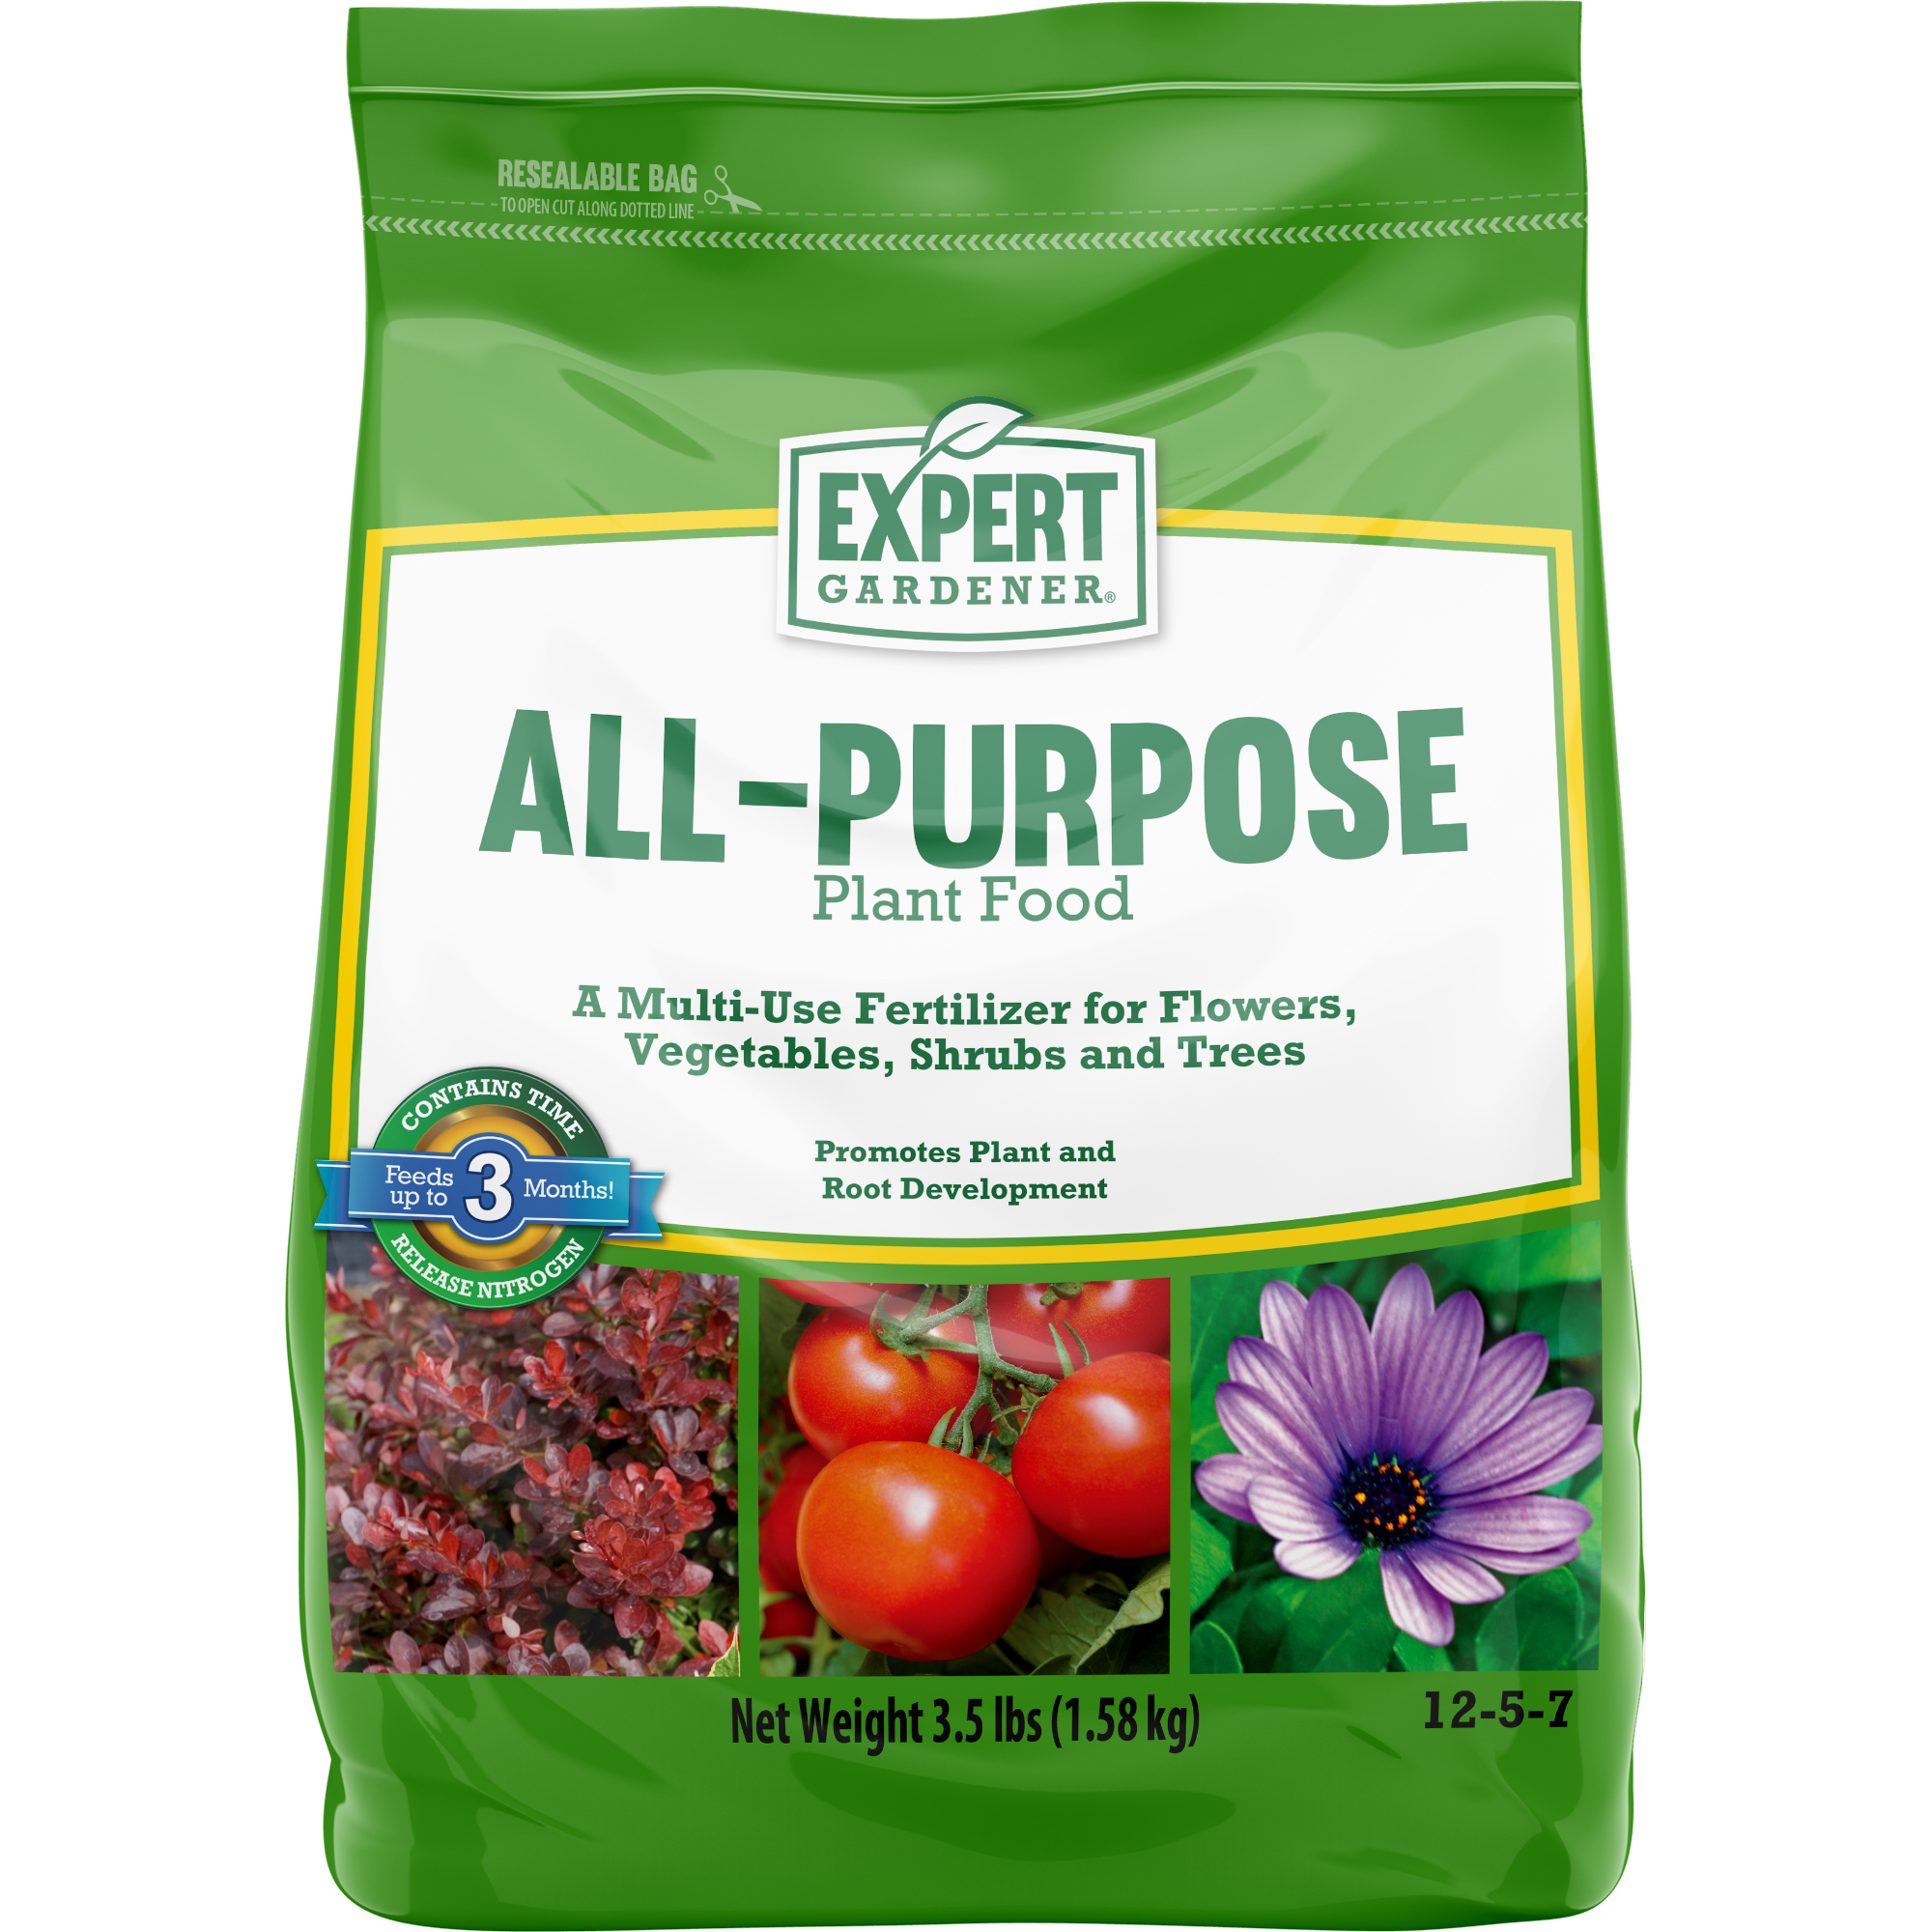 Expert Gardener All-Purpose Plant Food 12-5-7, 3.5 lbs.